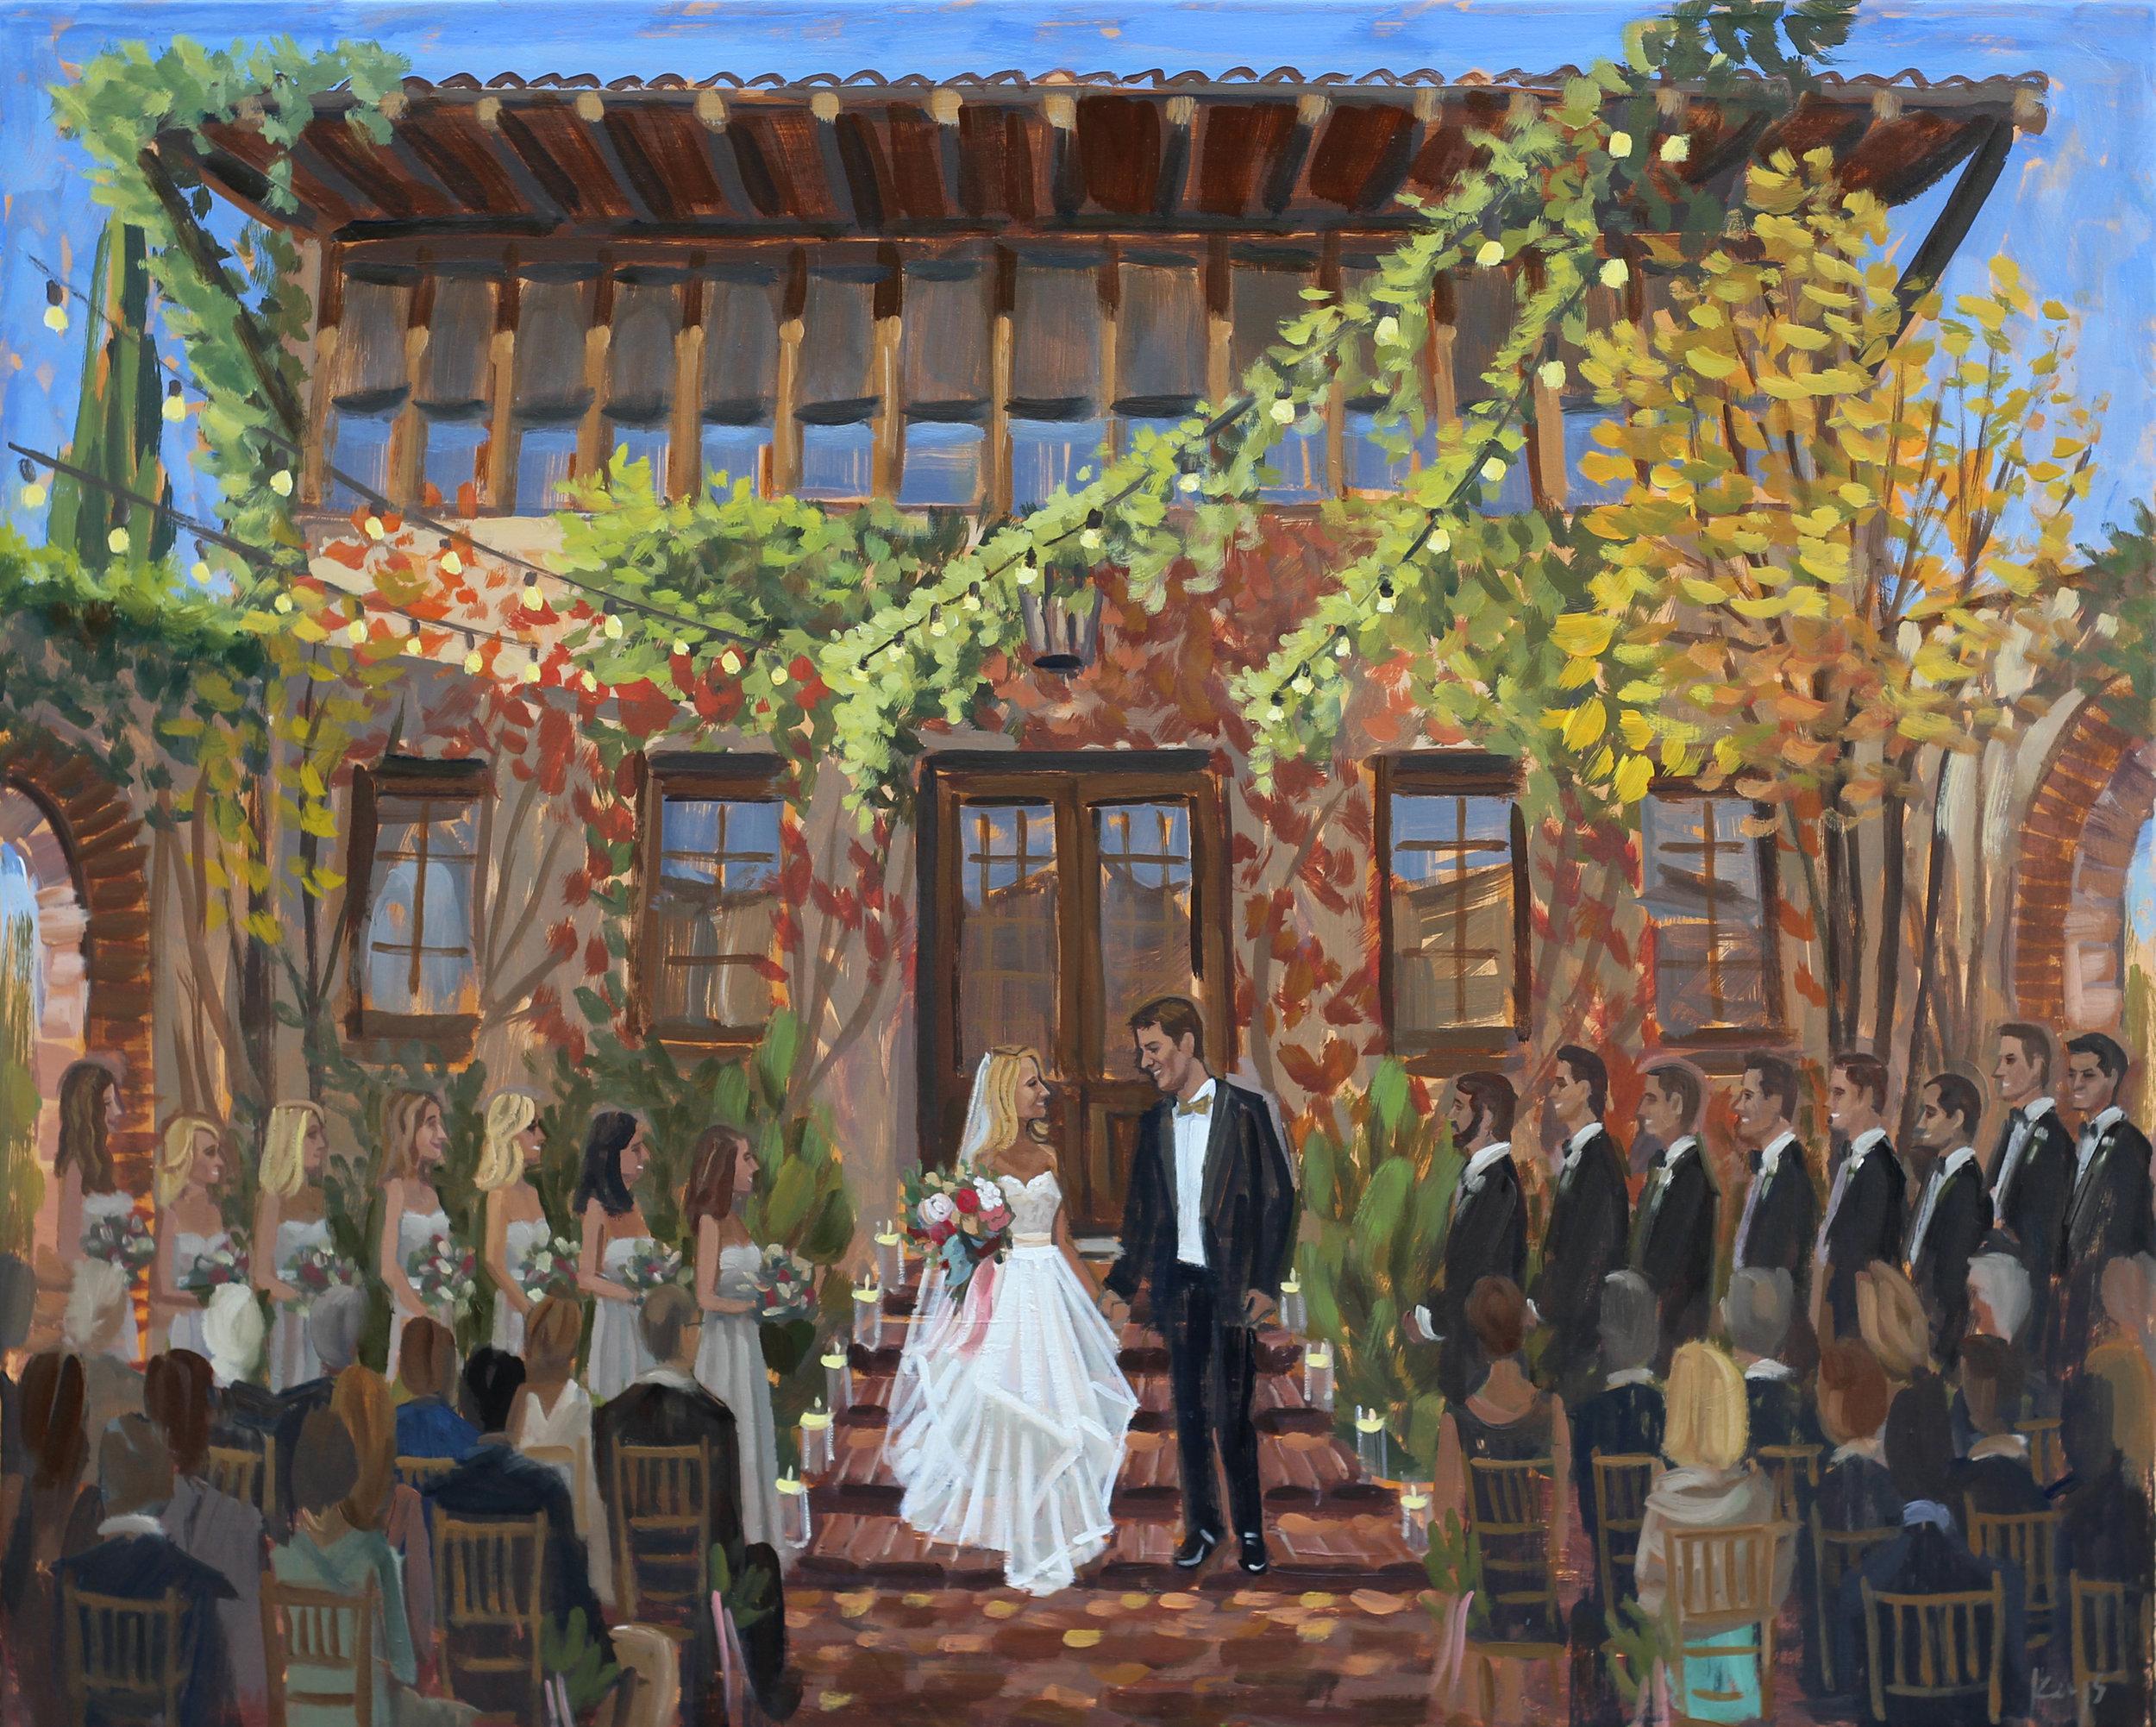 Live Wedding Painting | Summerour Studio, Atlanta, GA